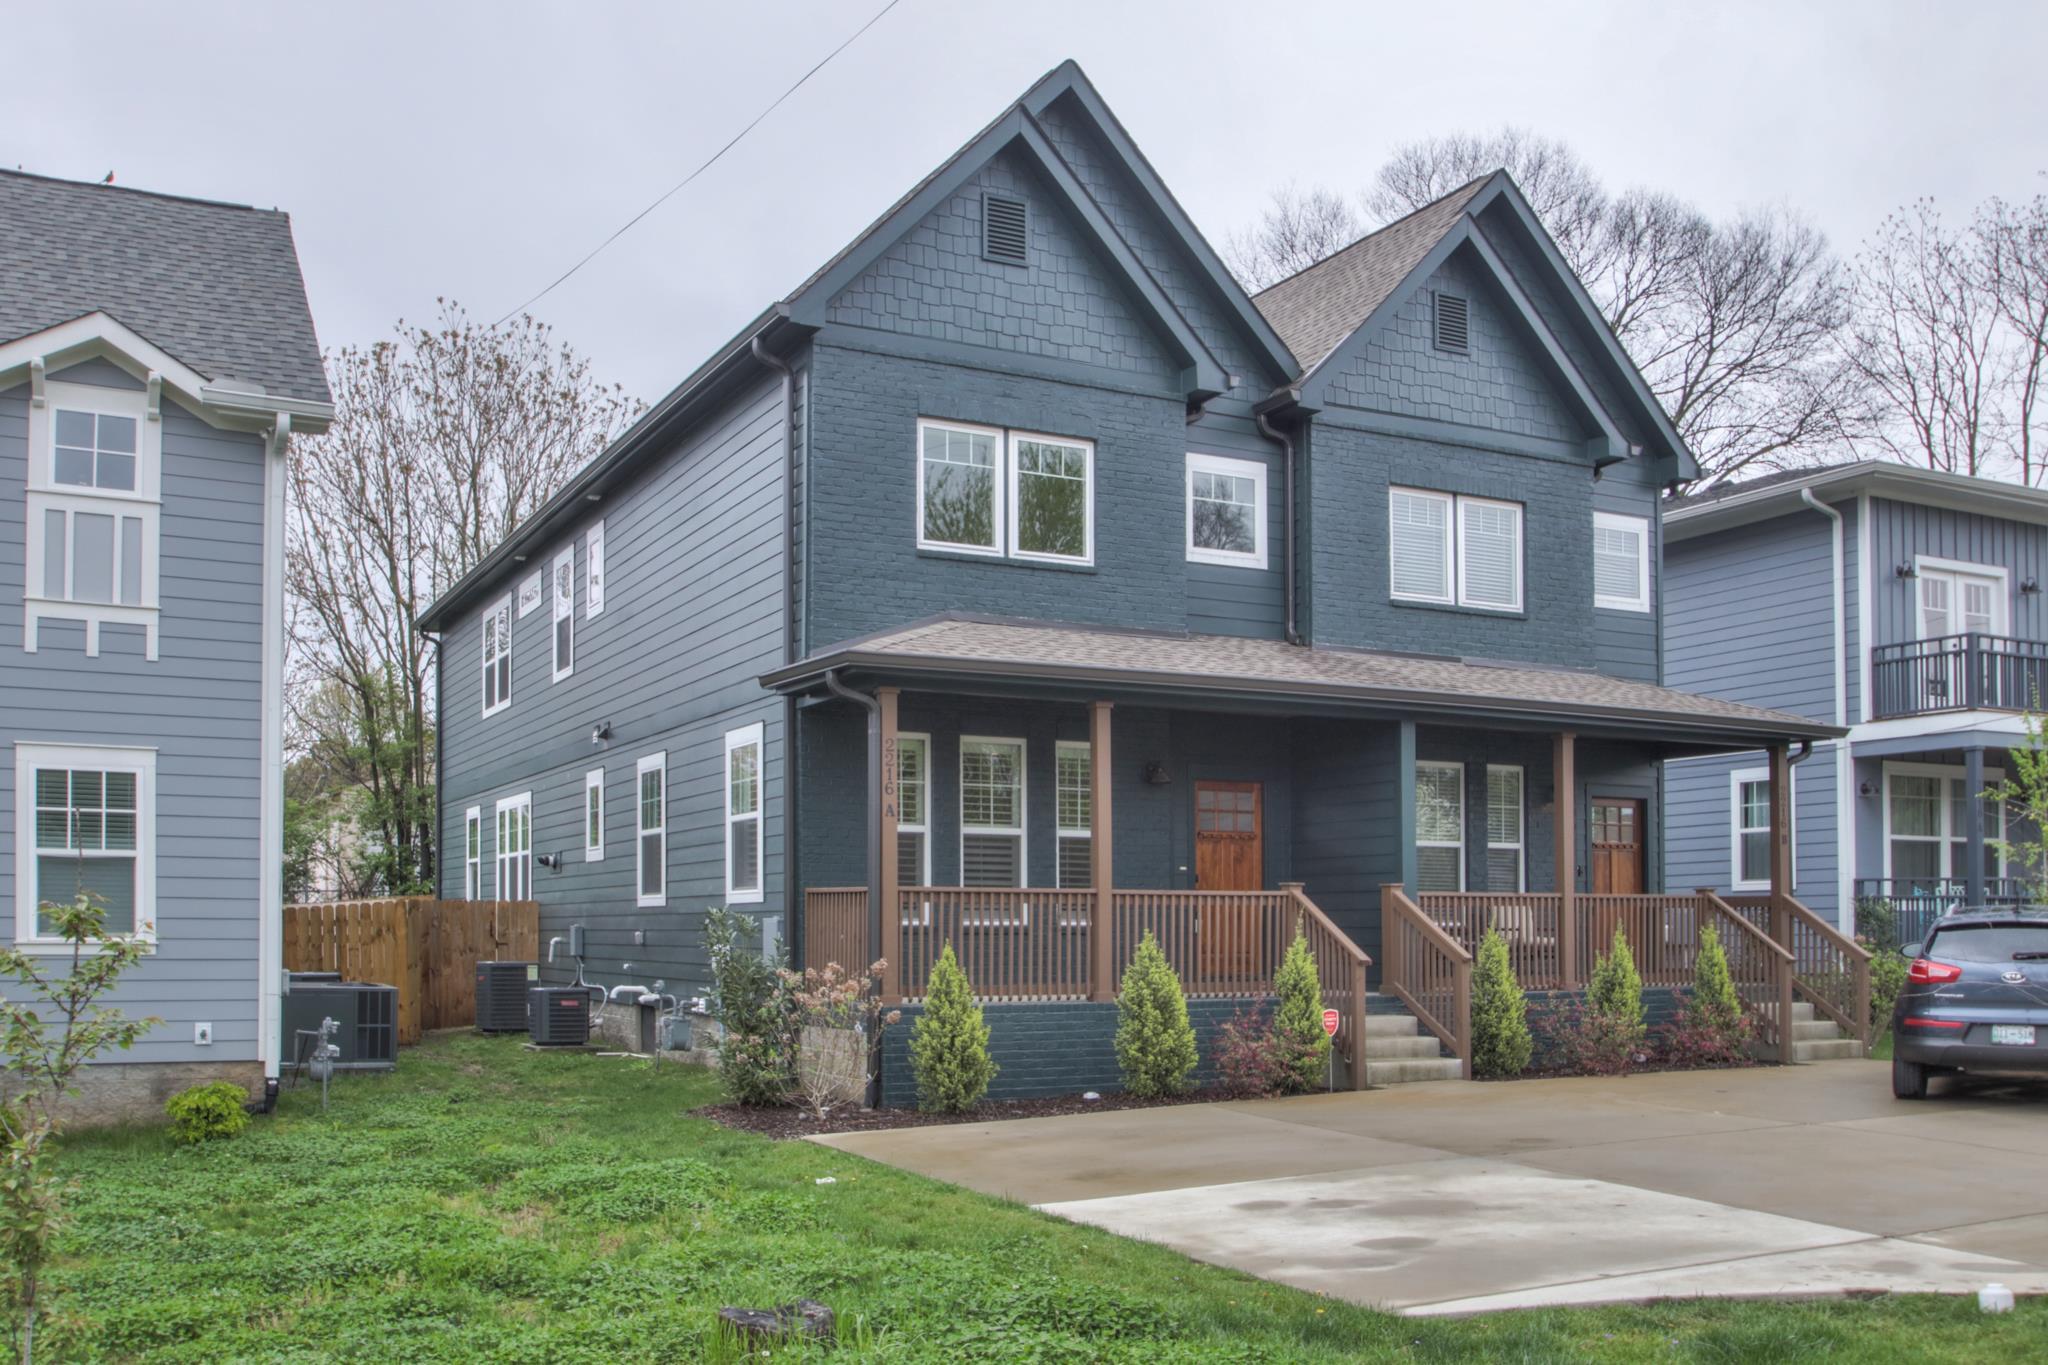 2216A Wickson Ave, Nashville, TN 37210 - Nashville, TN real estate listing